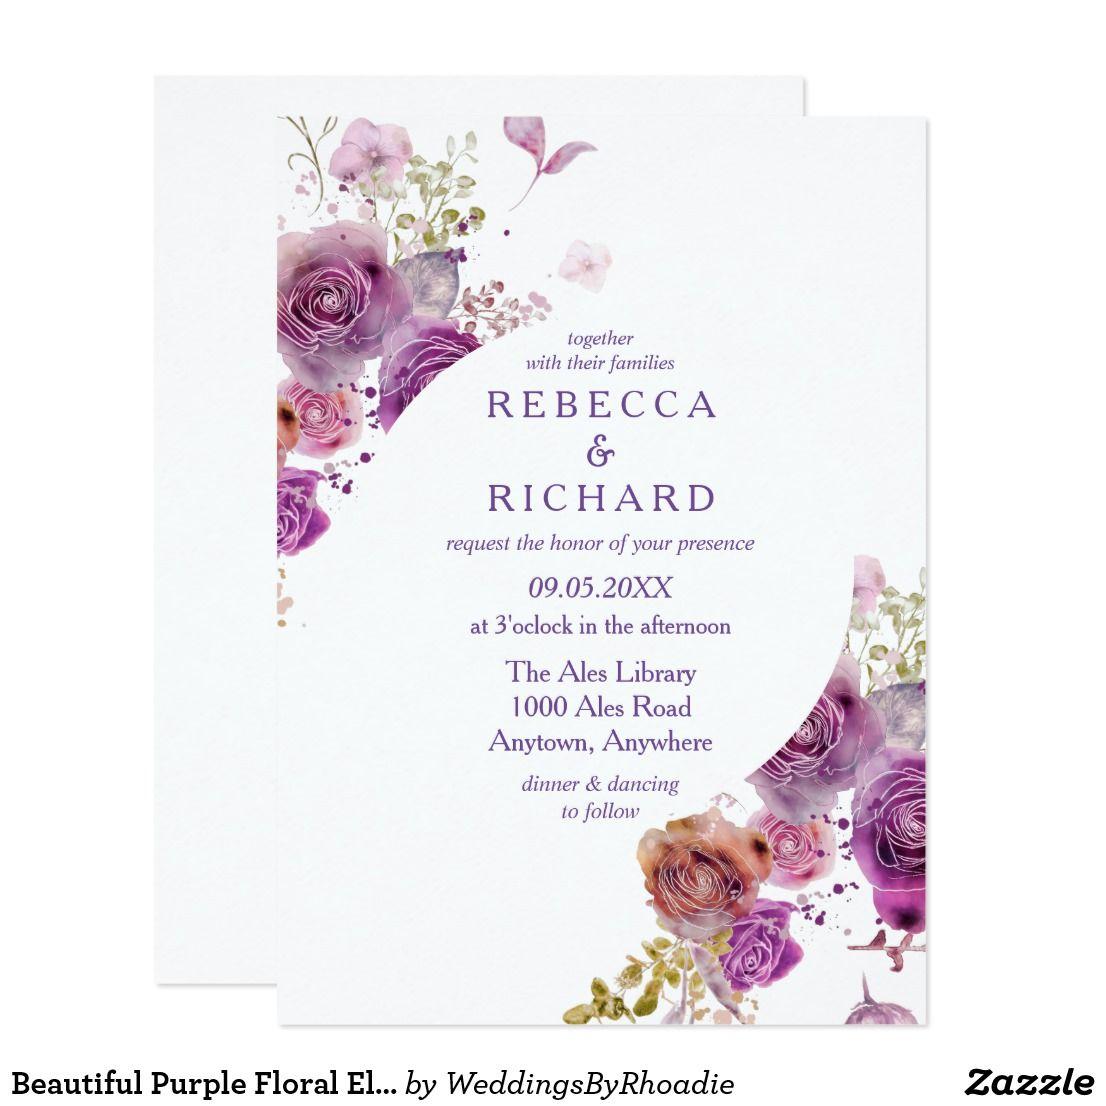 Purple Wedding Ideas With Pretty Details: Beautiful Purple Floral Elegance Wedding Invitation